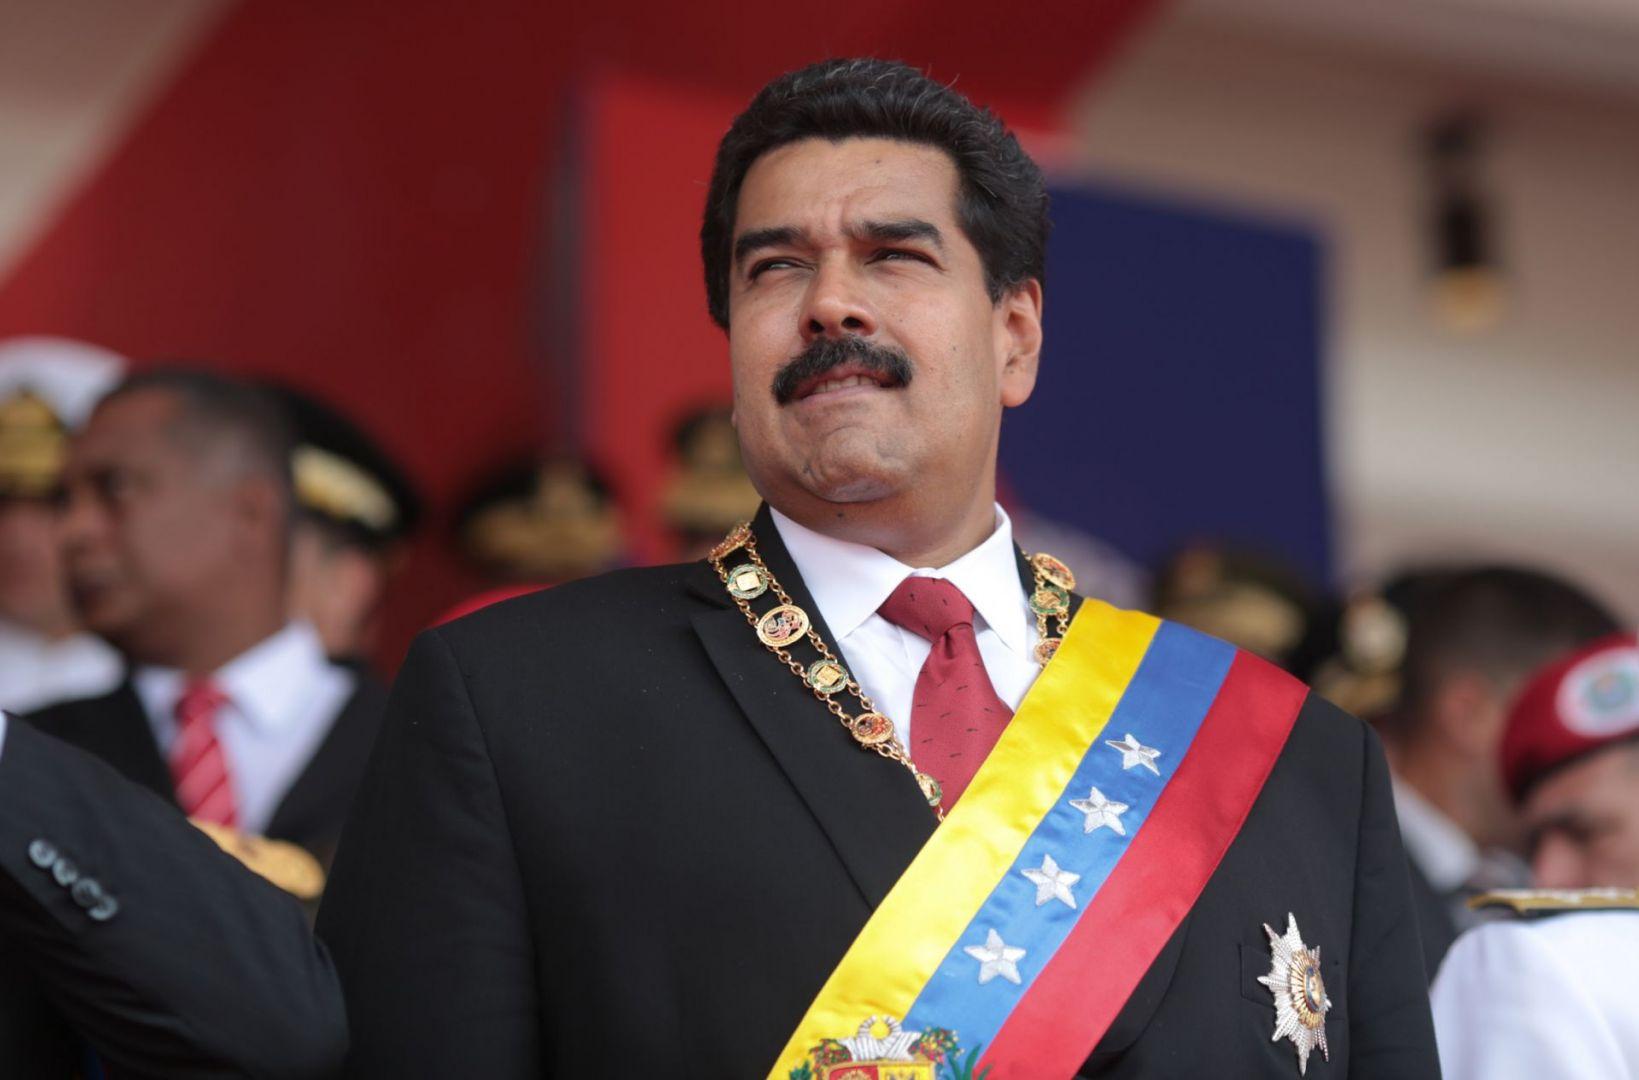 Мадуро заявил, что мечтает пожать руку Трампу